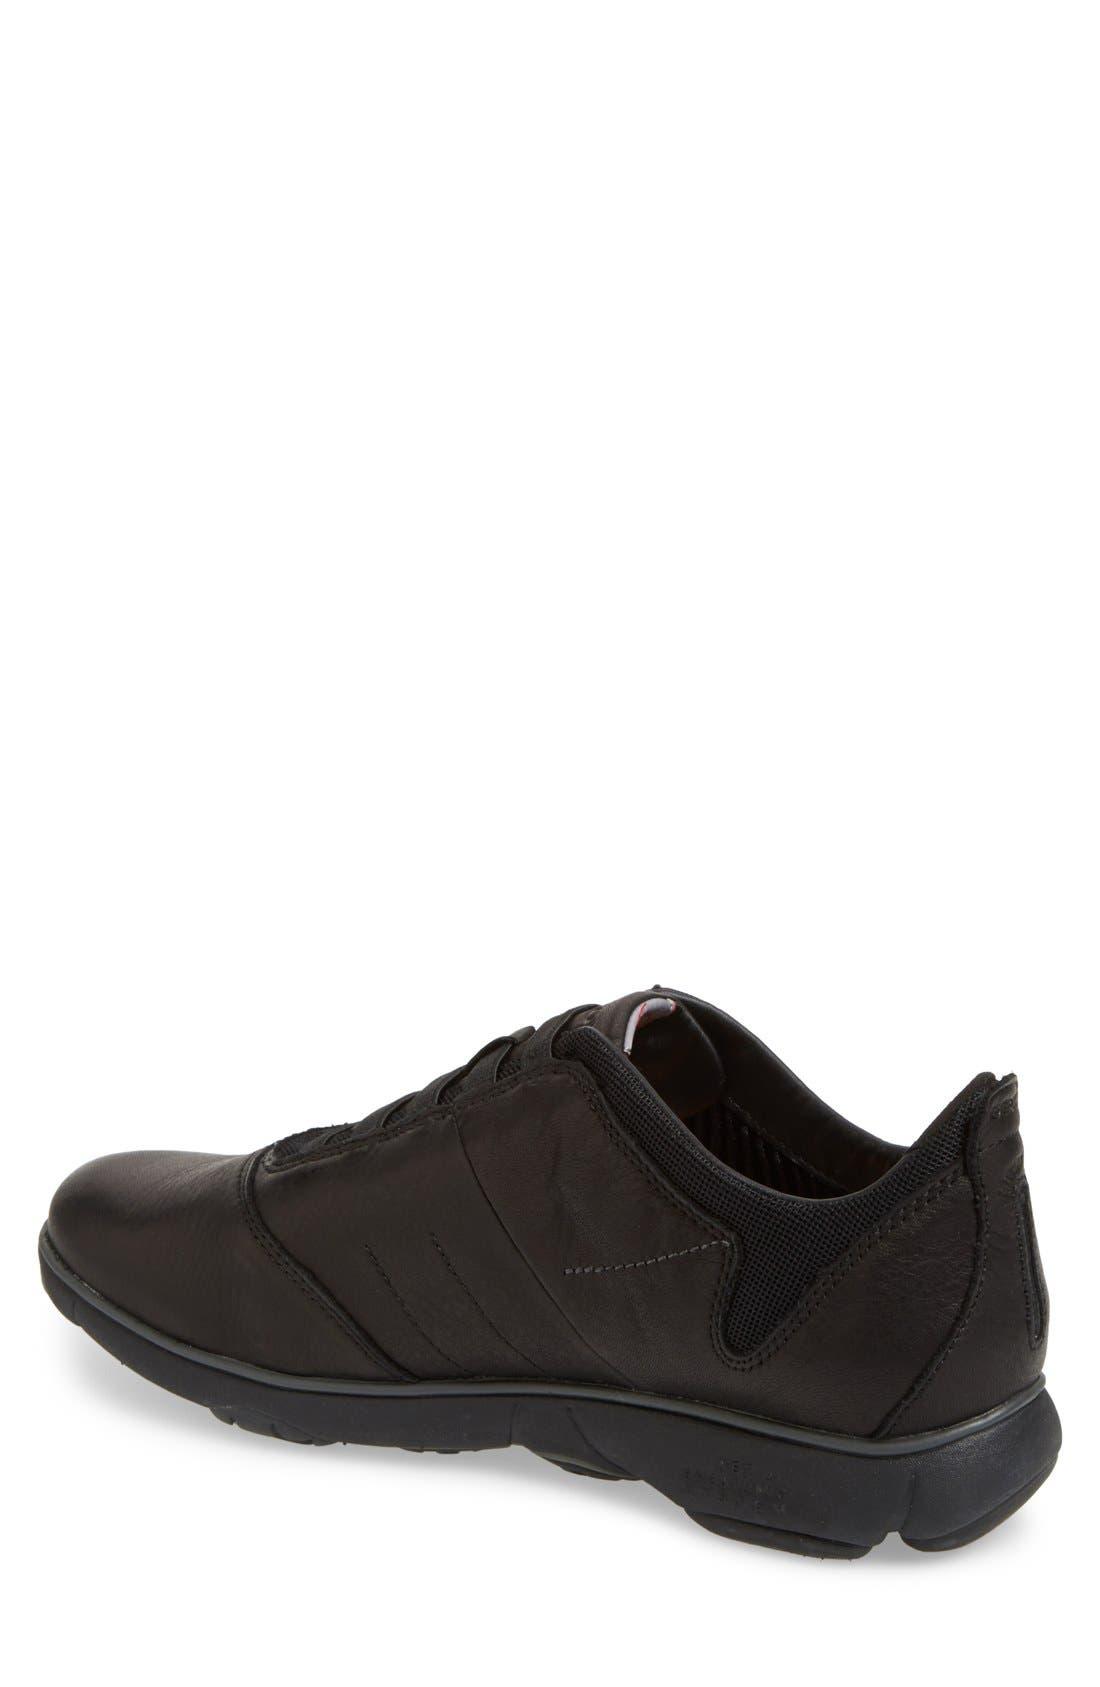 'Nebula 8' Sneaker,                             Alternate thumbnail 8, color,                             BLACK